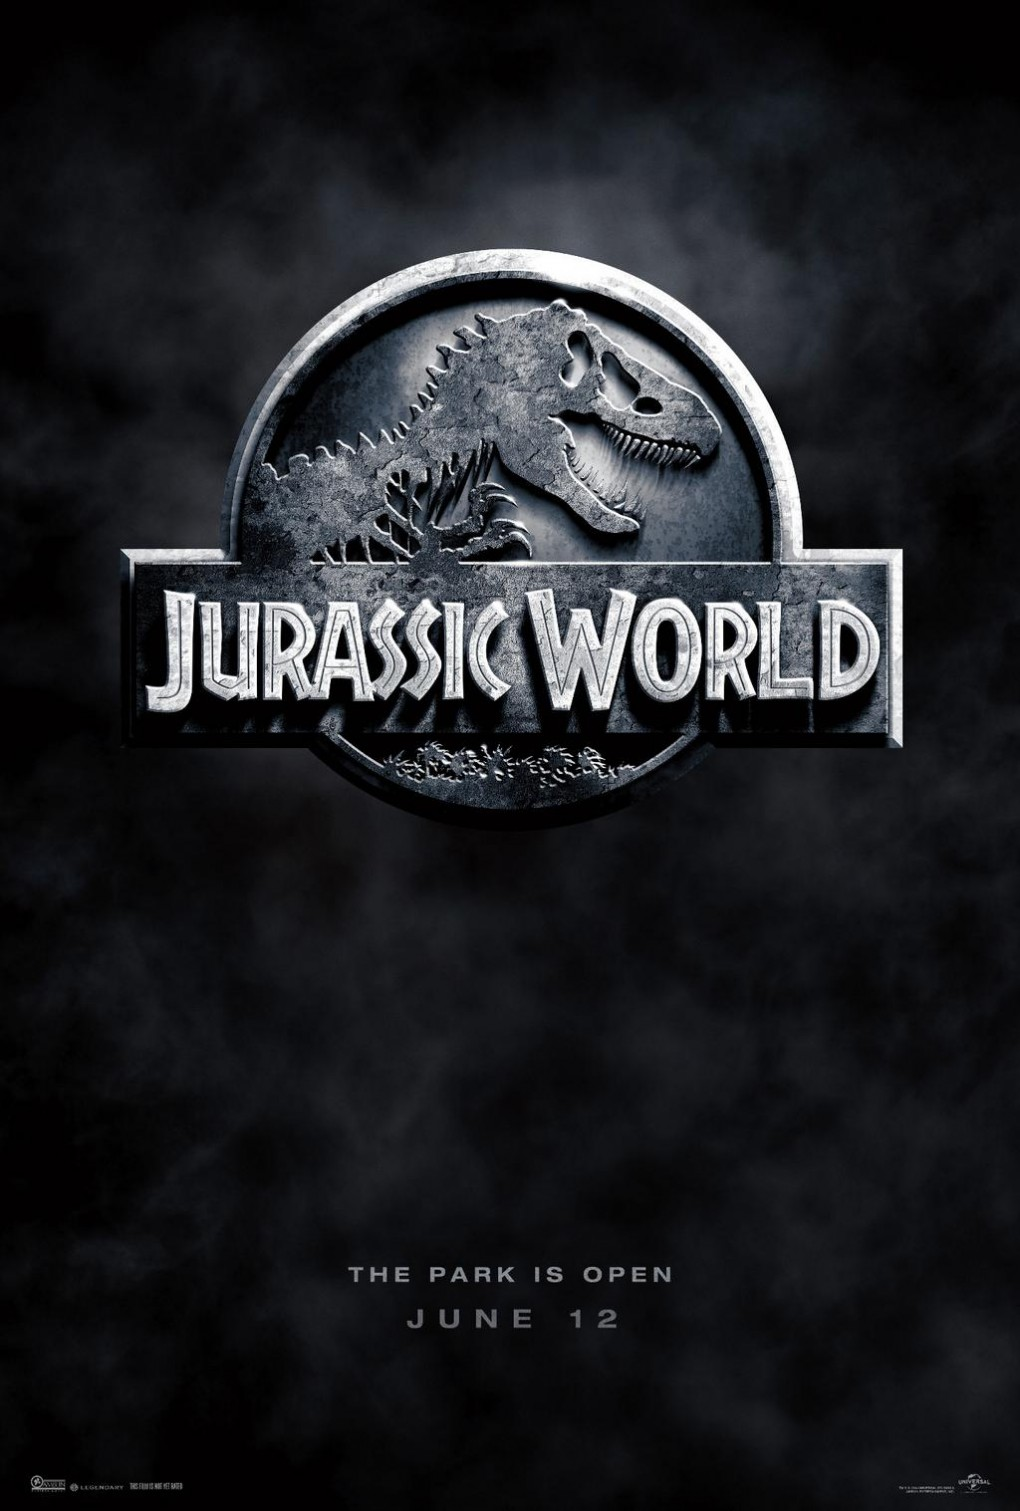 Jurassic World : Premier Poster Officiel !